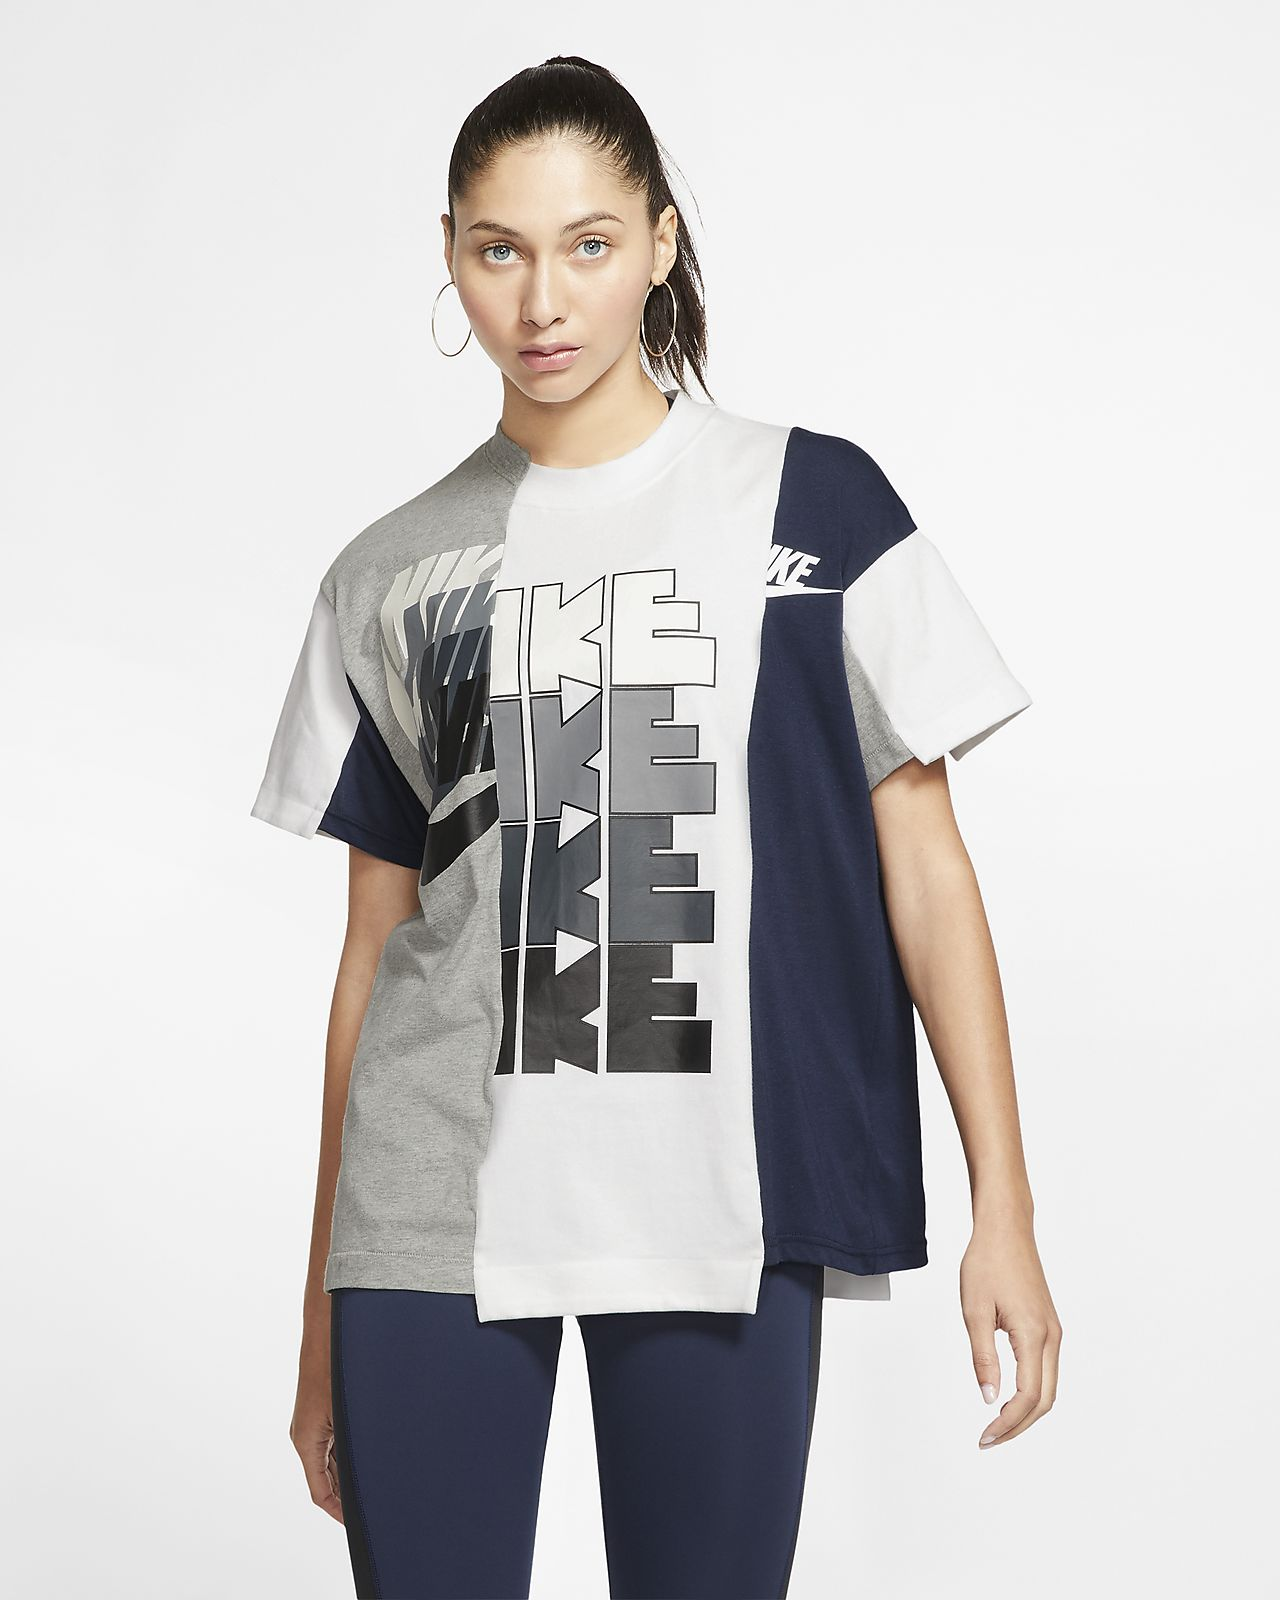 Nike x Sacai Hybrid-T-Shirt für Damen